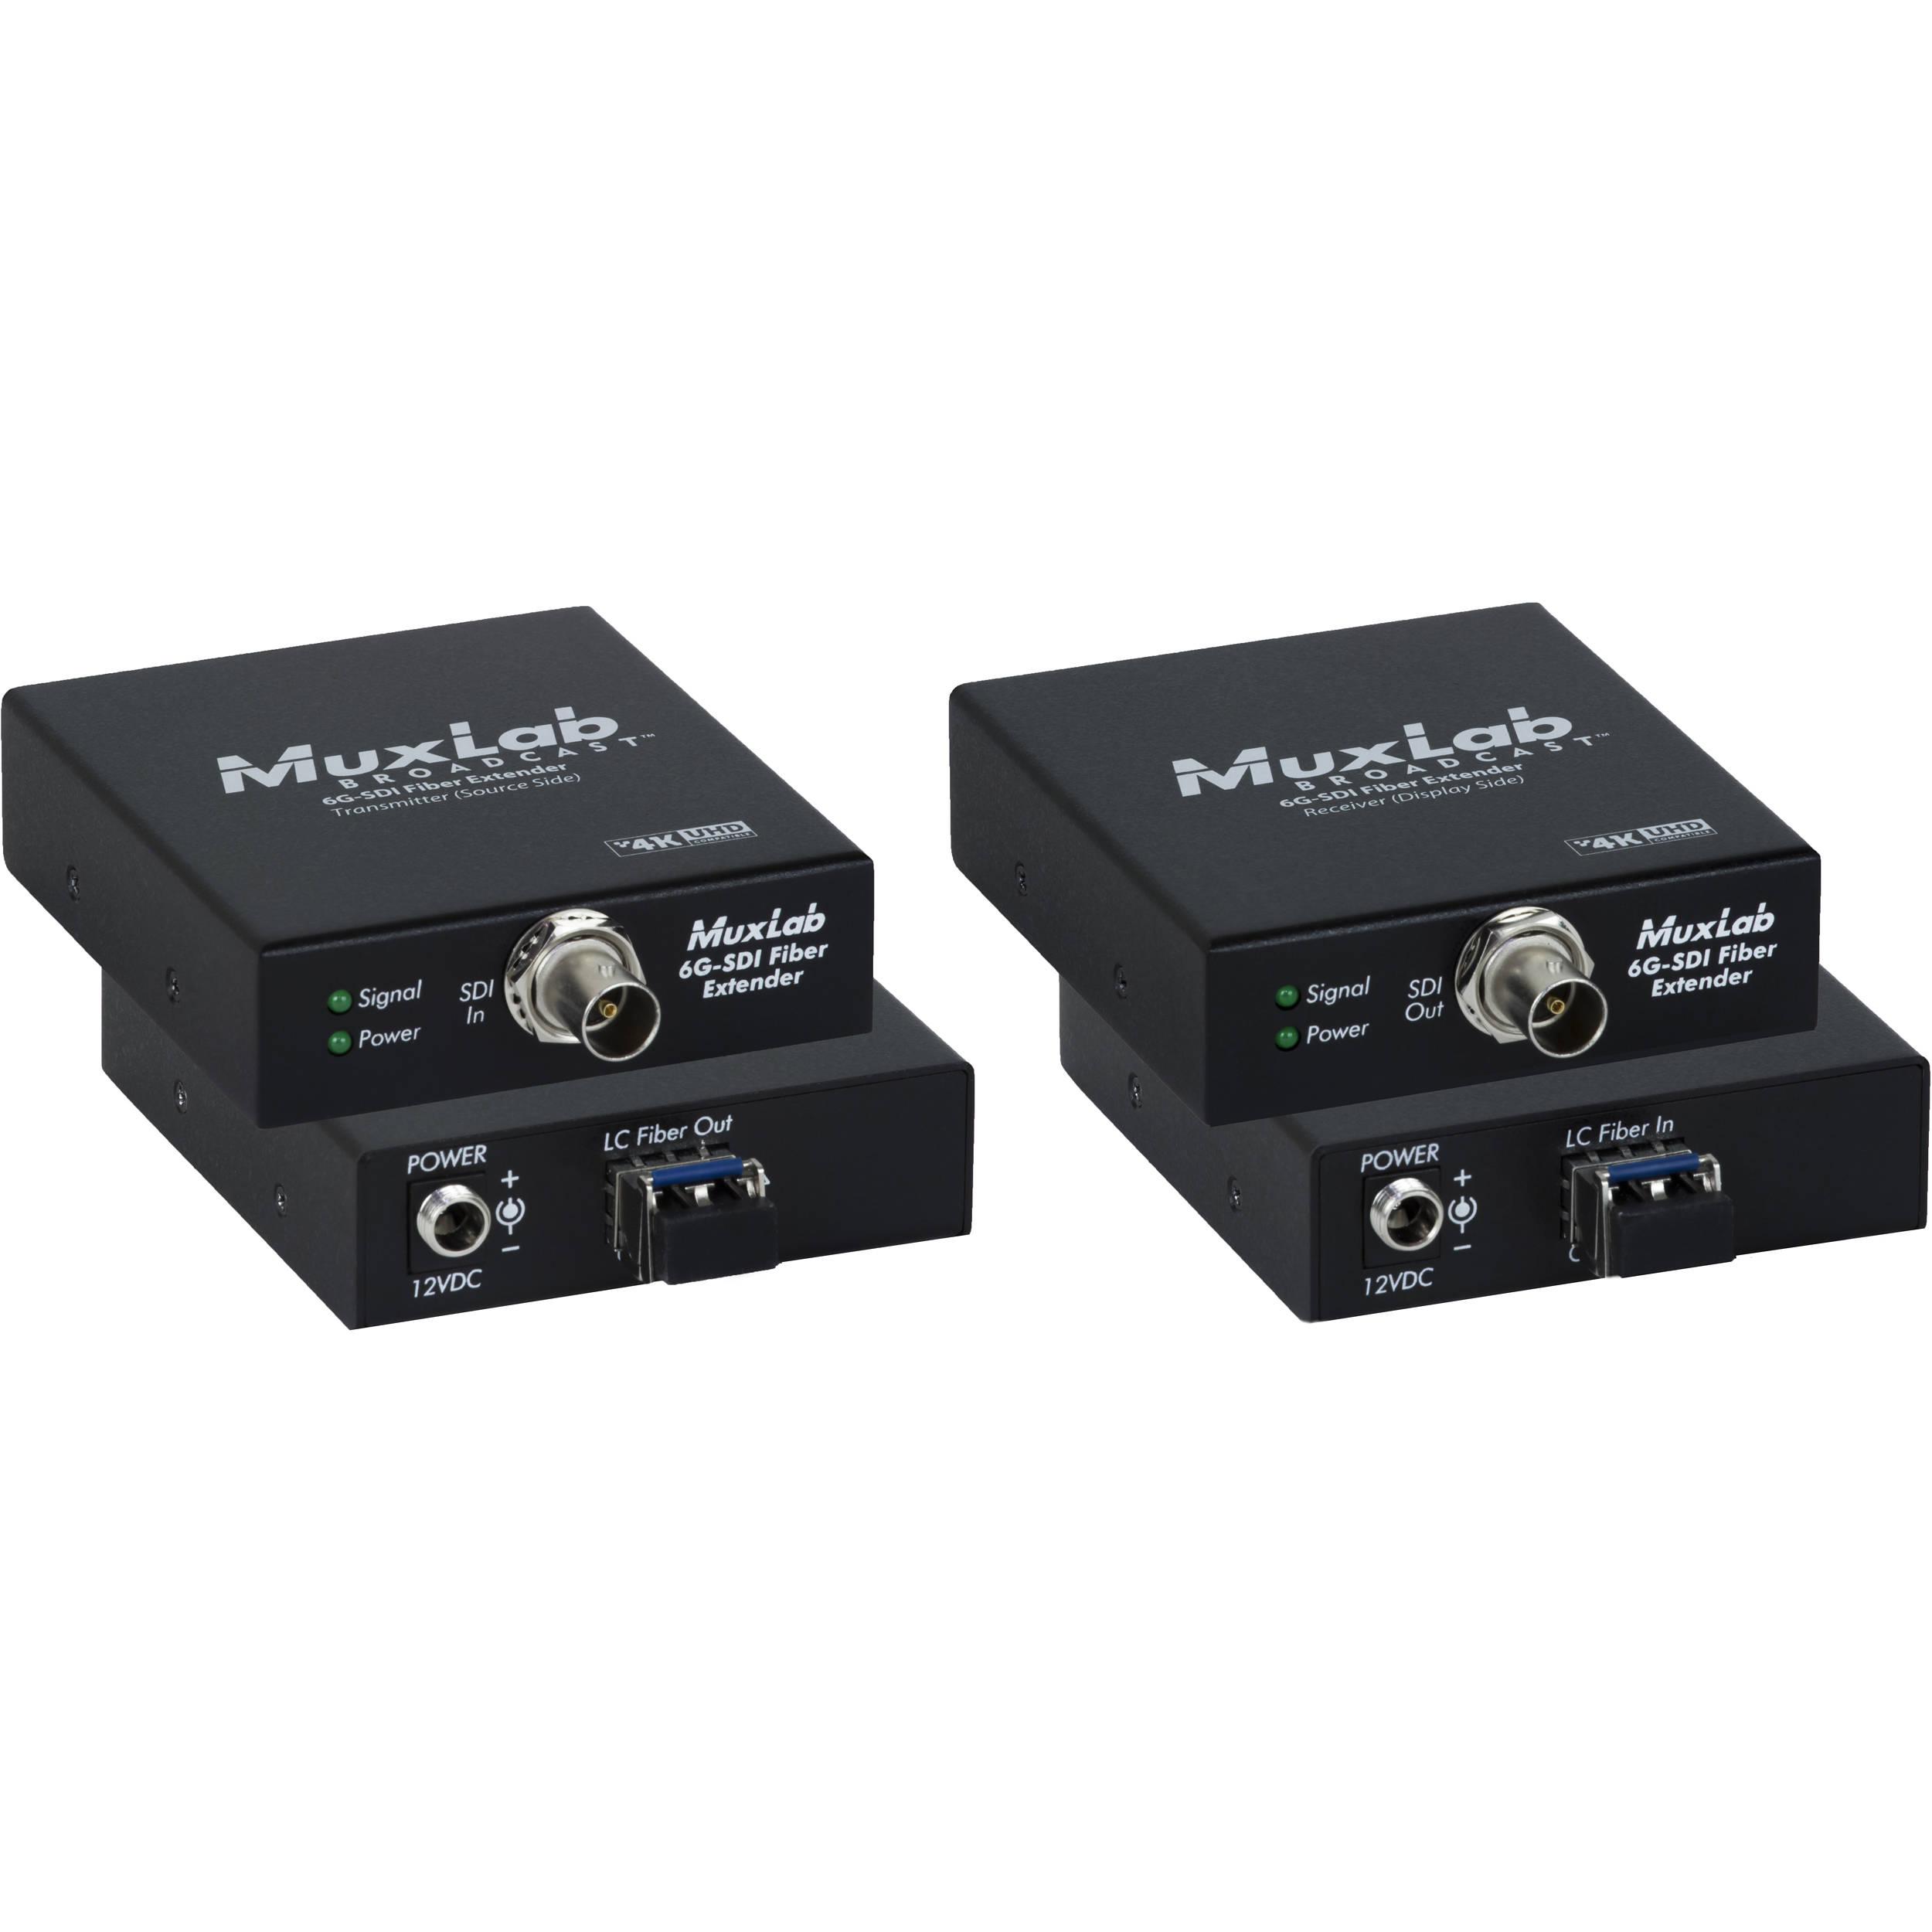 Https C Product 1205105 Reg Noga Power Indicator Guard Muxlab 500712 6g Sdi Fiber Extender Kit 1262714